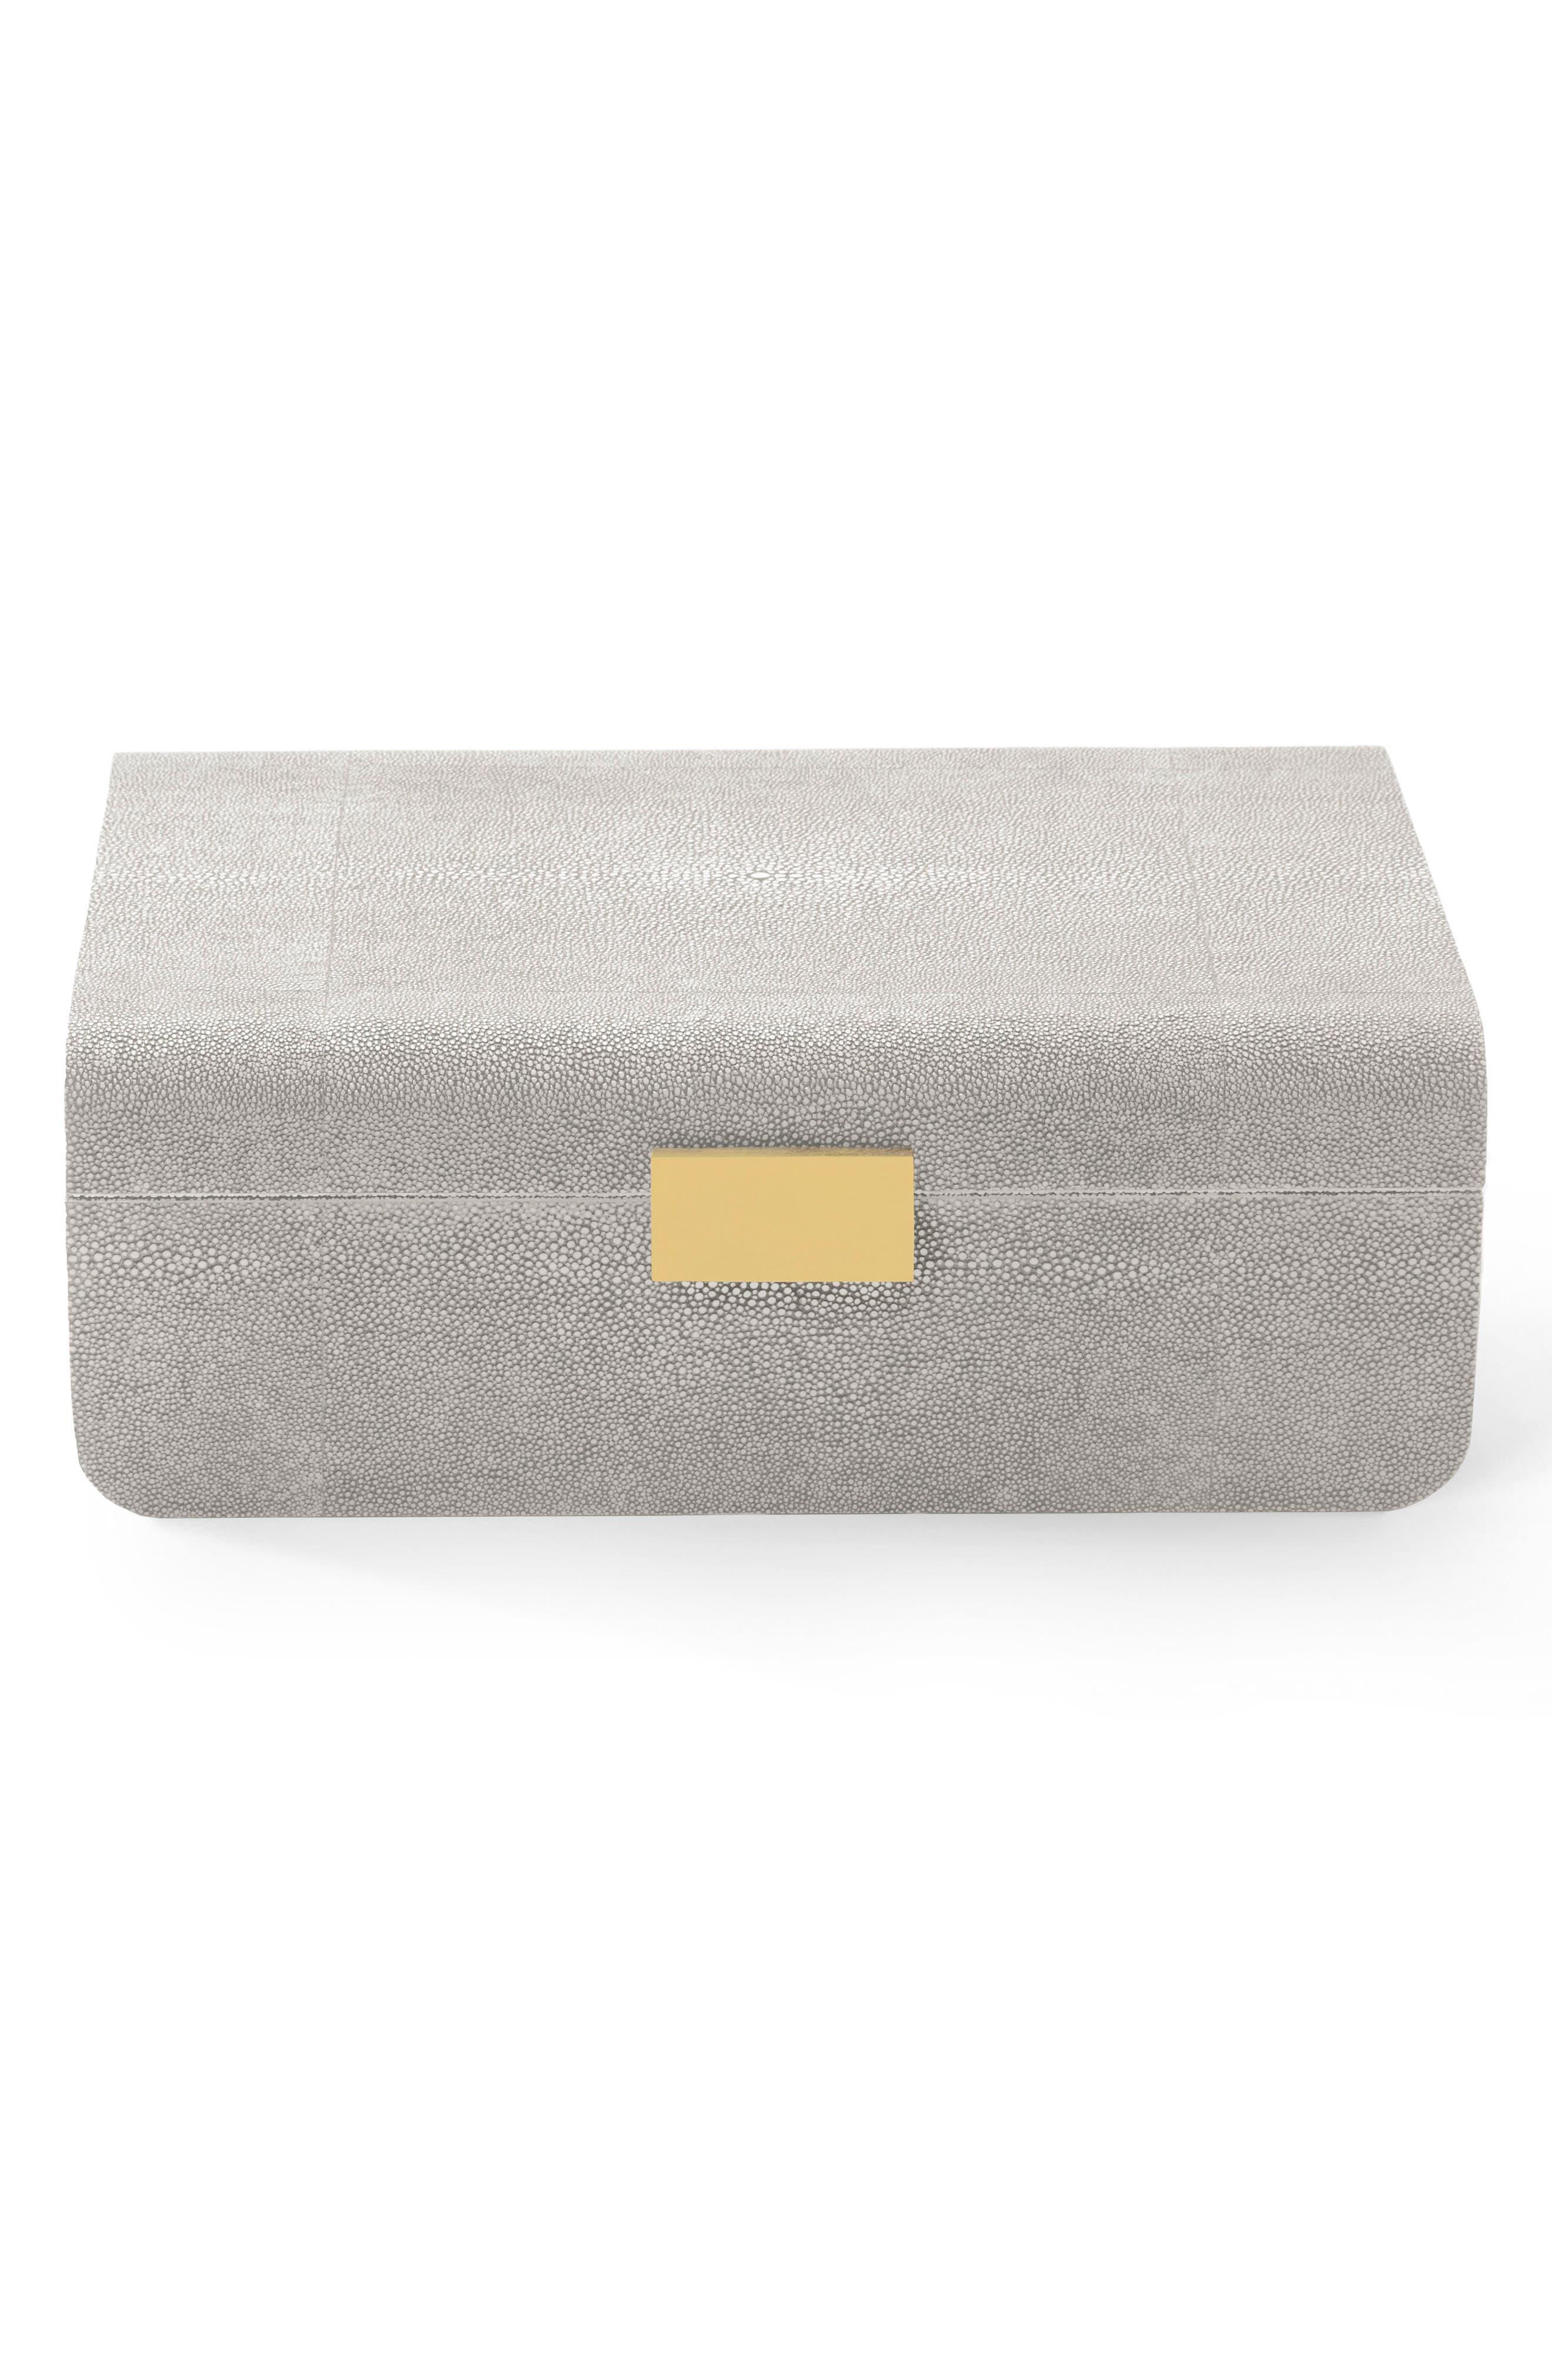 AERIN Modern Shagreen Jewelry Box